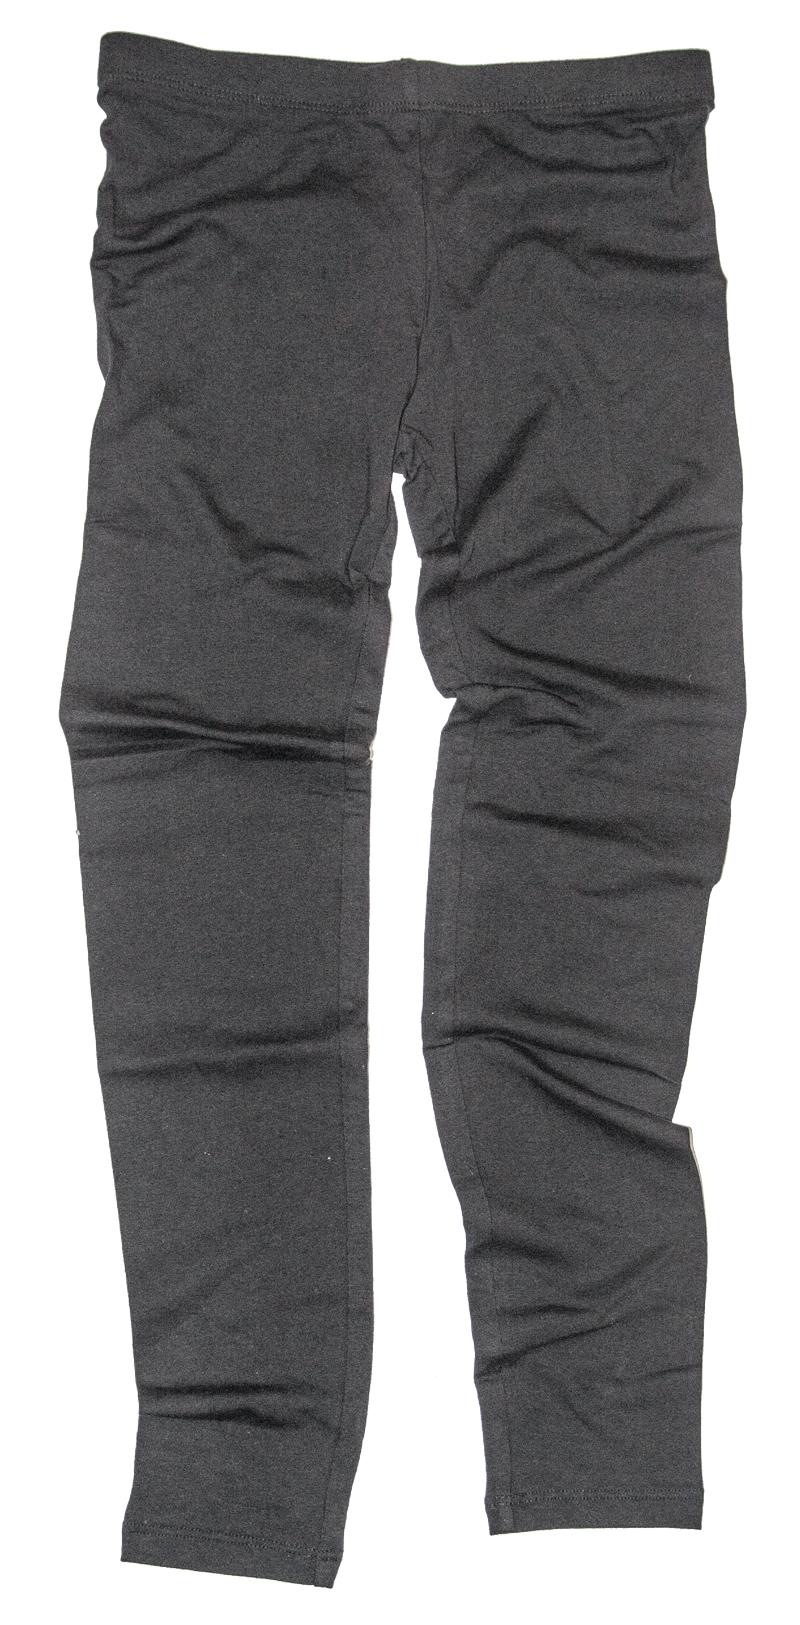 Swim Rags Fitness Yoga Pants - Black